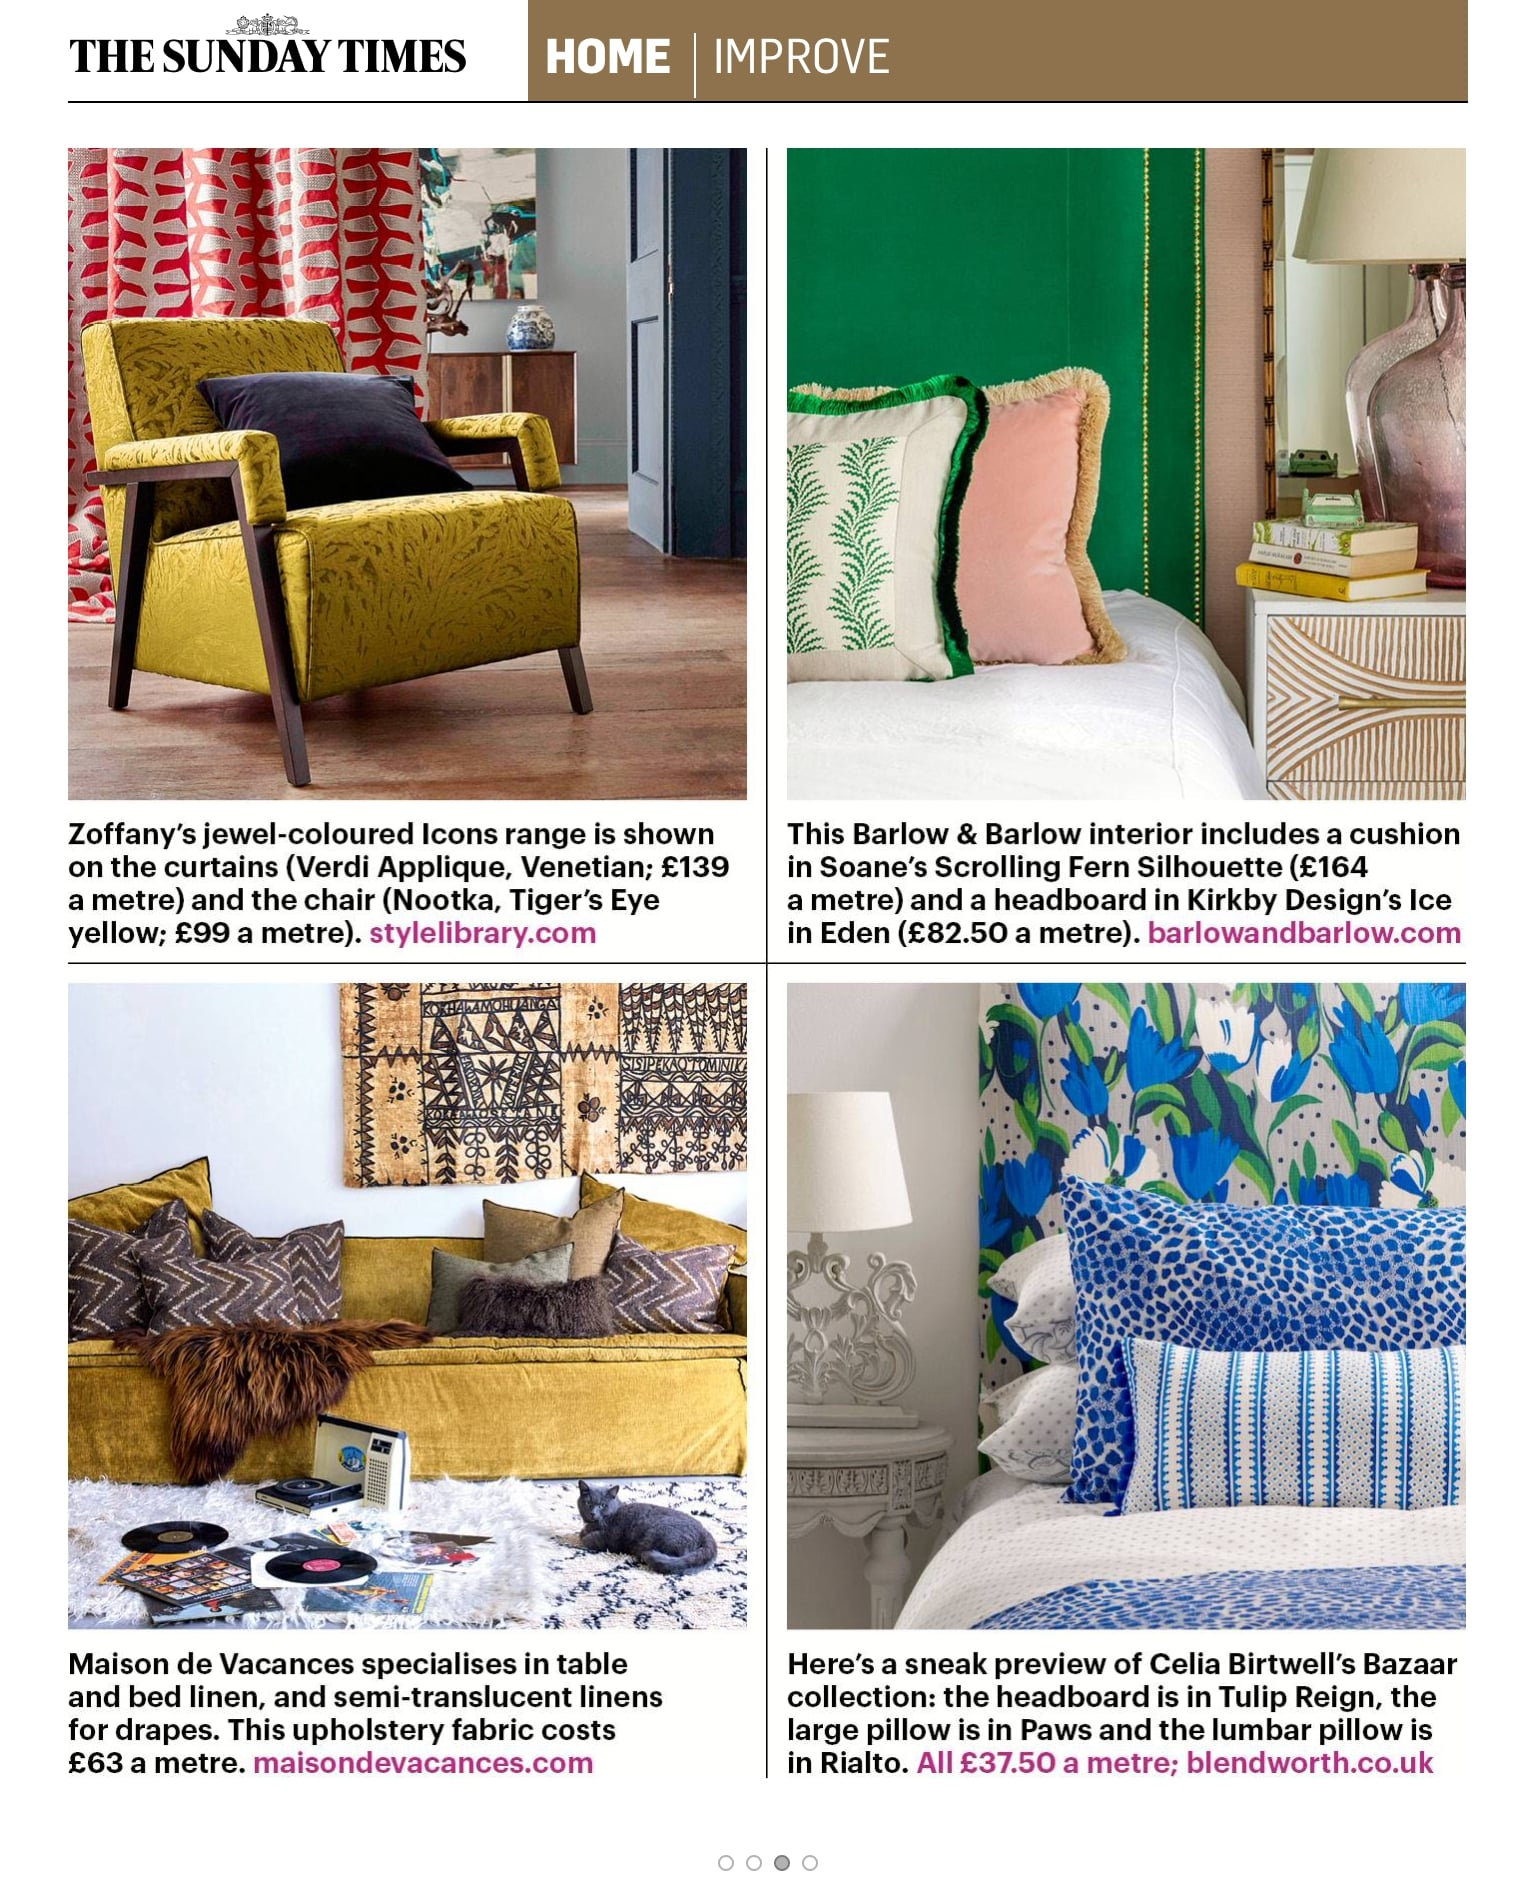 The Sunday Times Home 3rd February 2019 Blendworth.jpg